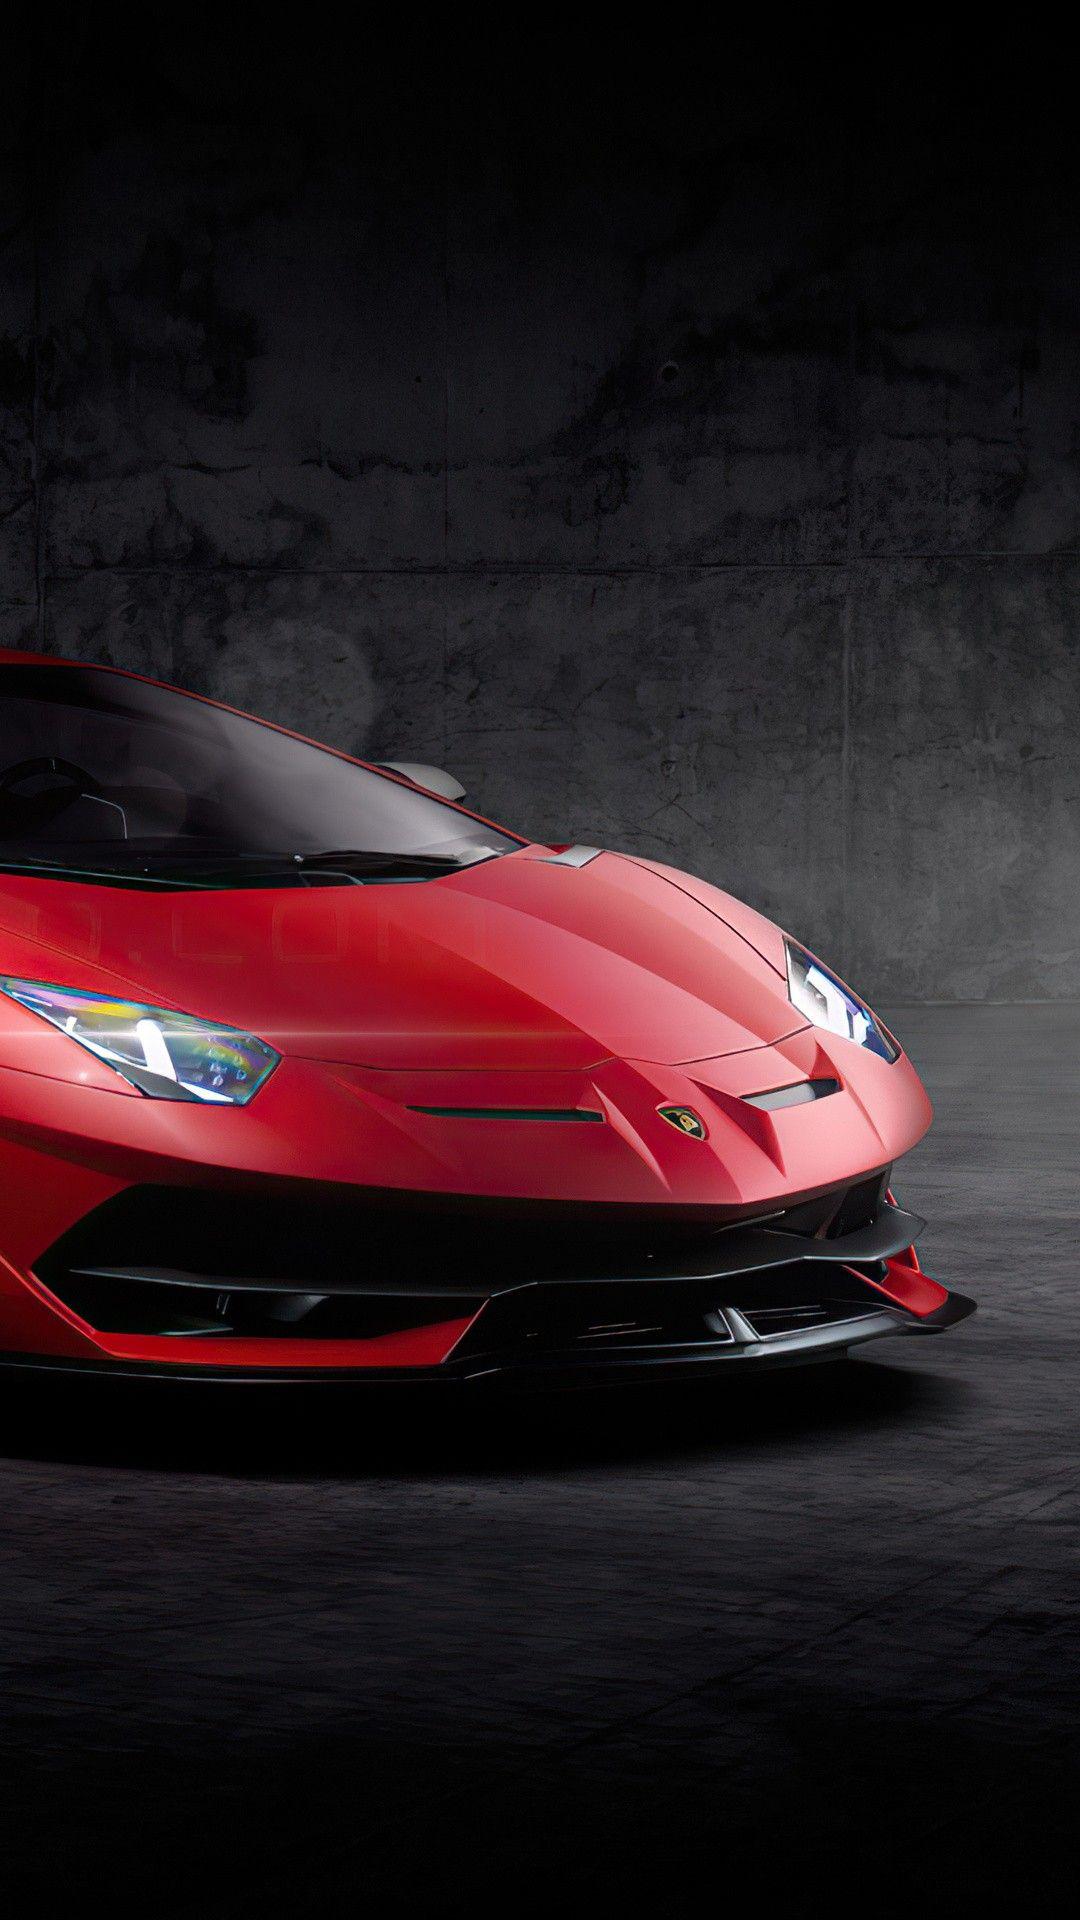 Red Lamborghini Samsung Galaxy M31 Full Hd 1920p Wallpapers In 2021 Red Lamborghini Lamborghini Cool Sports Cars